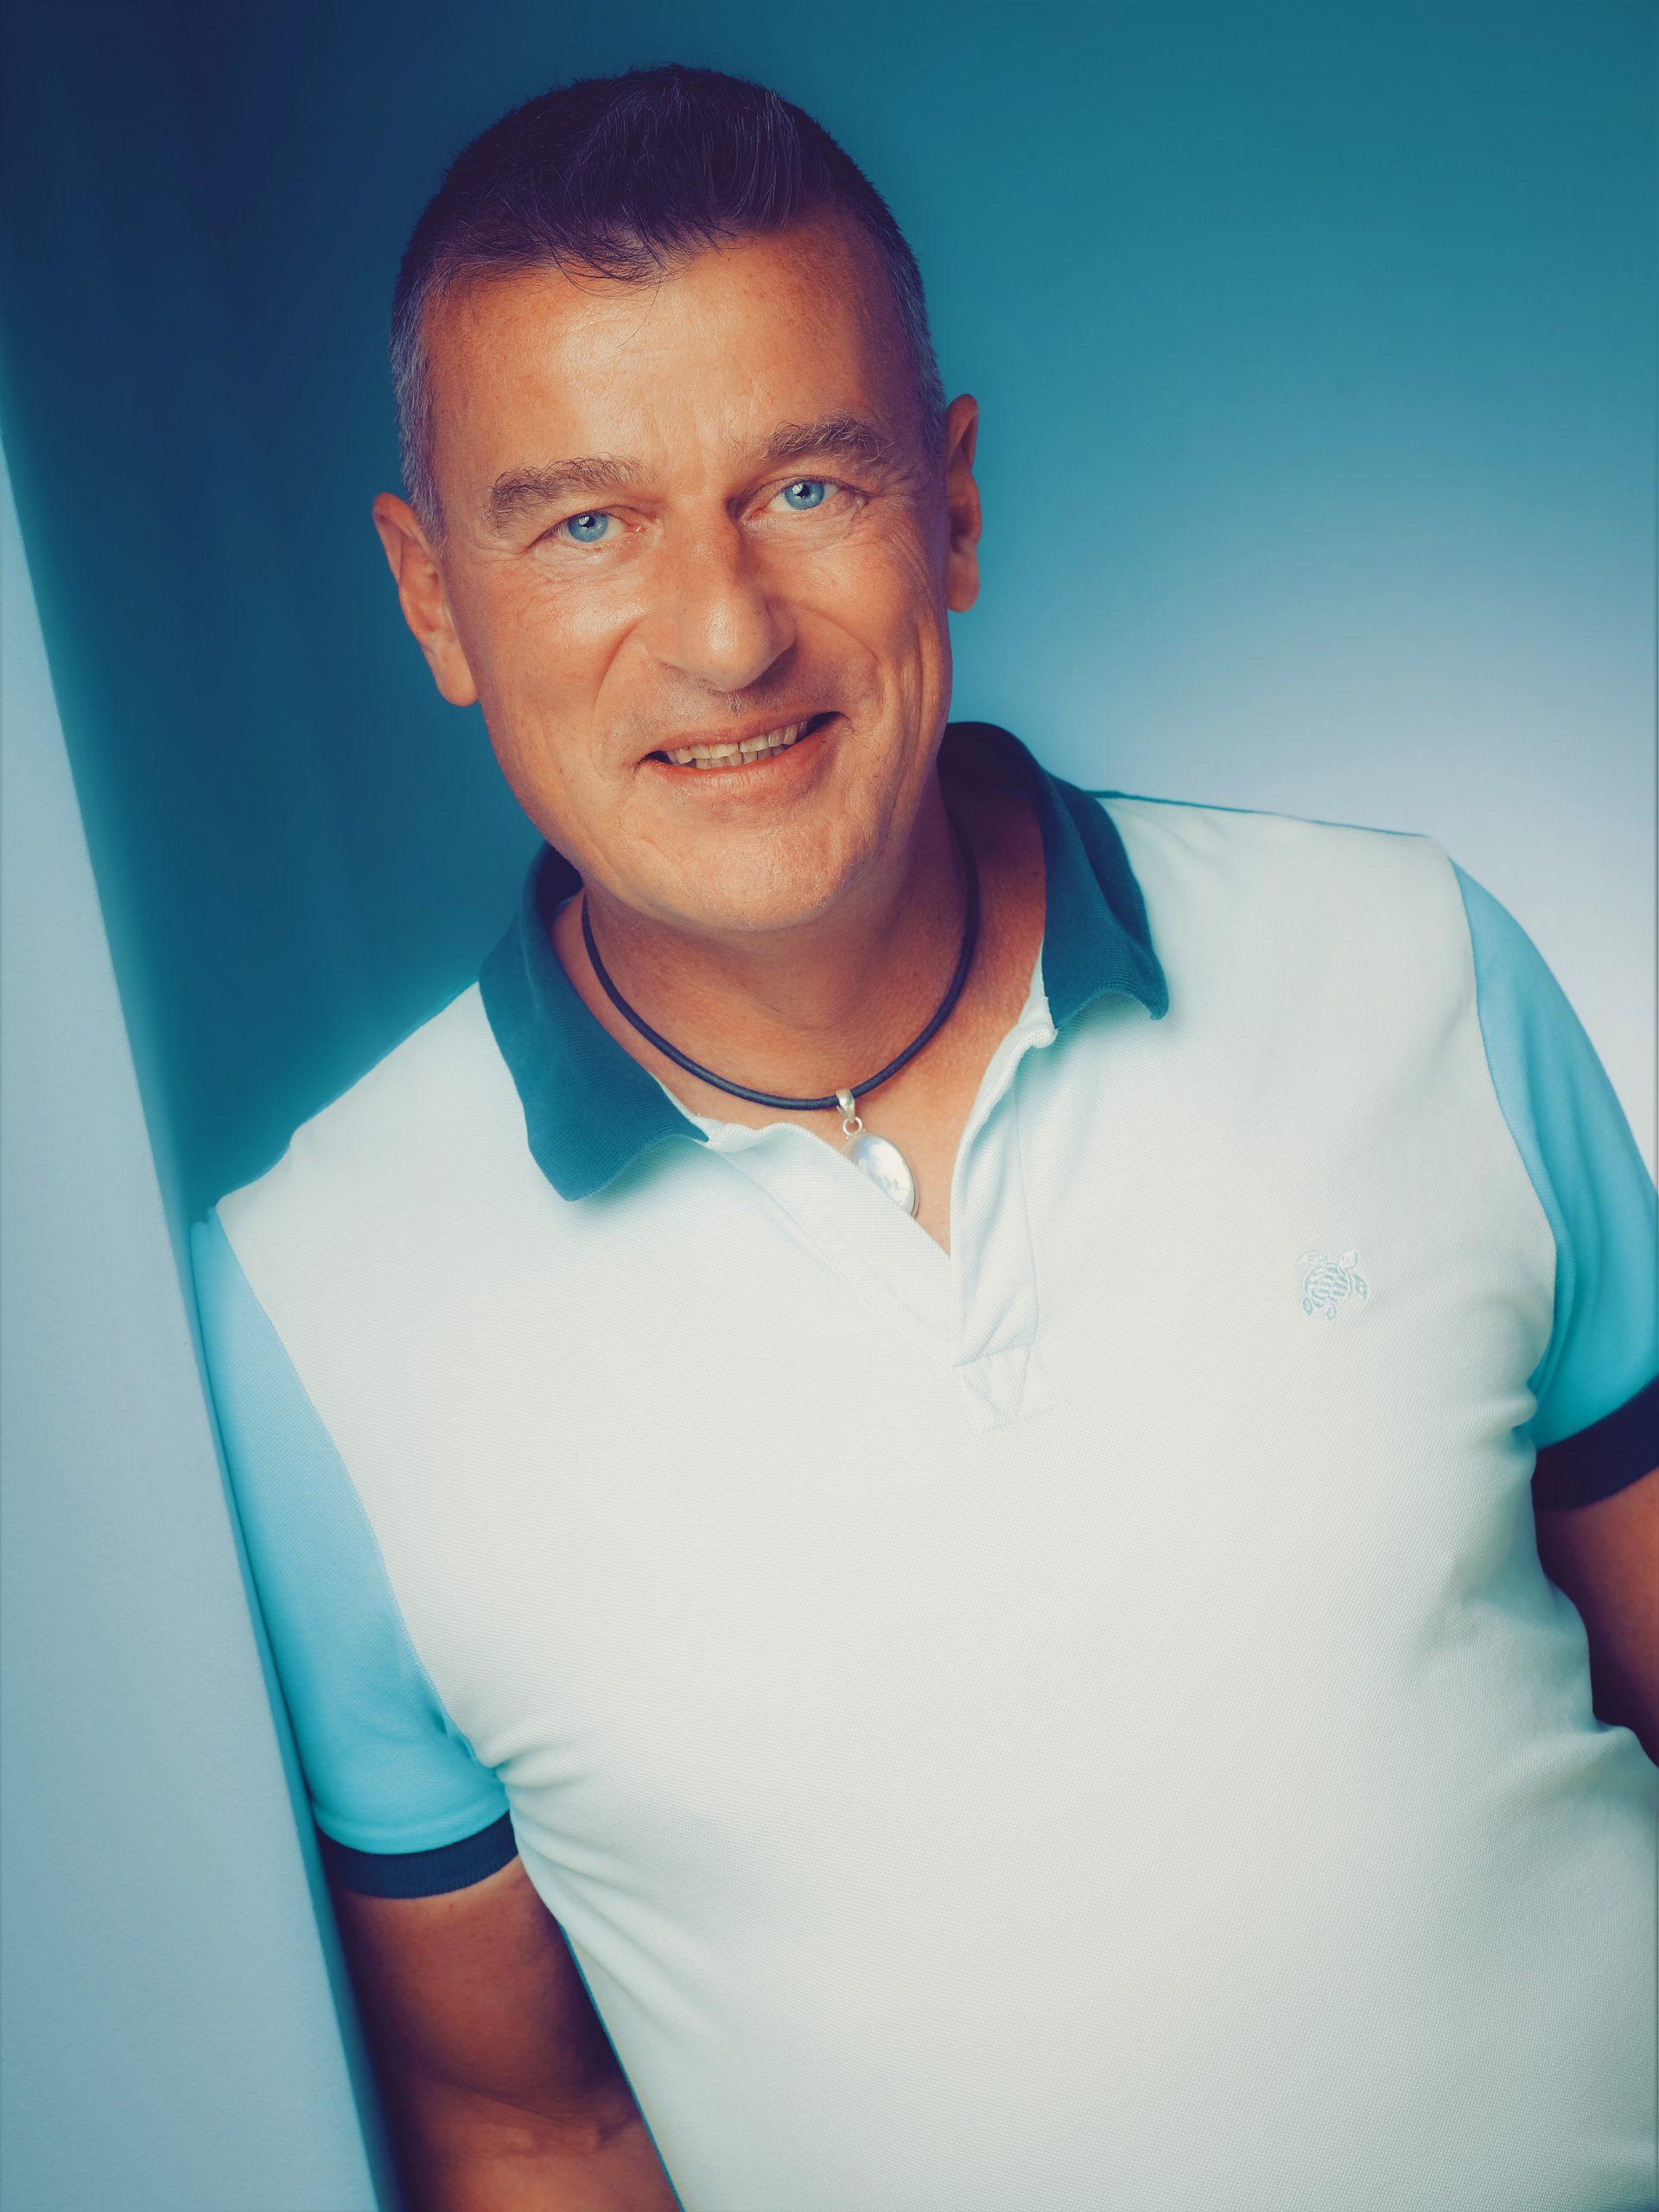 Udo Baer